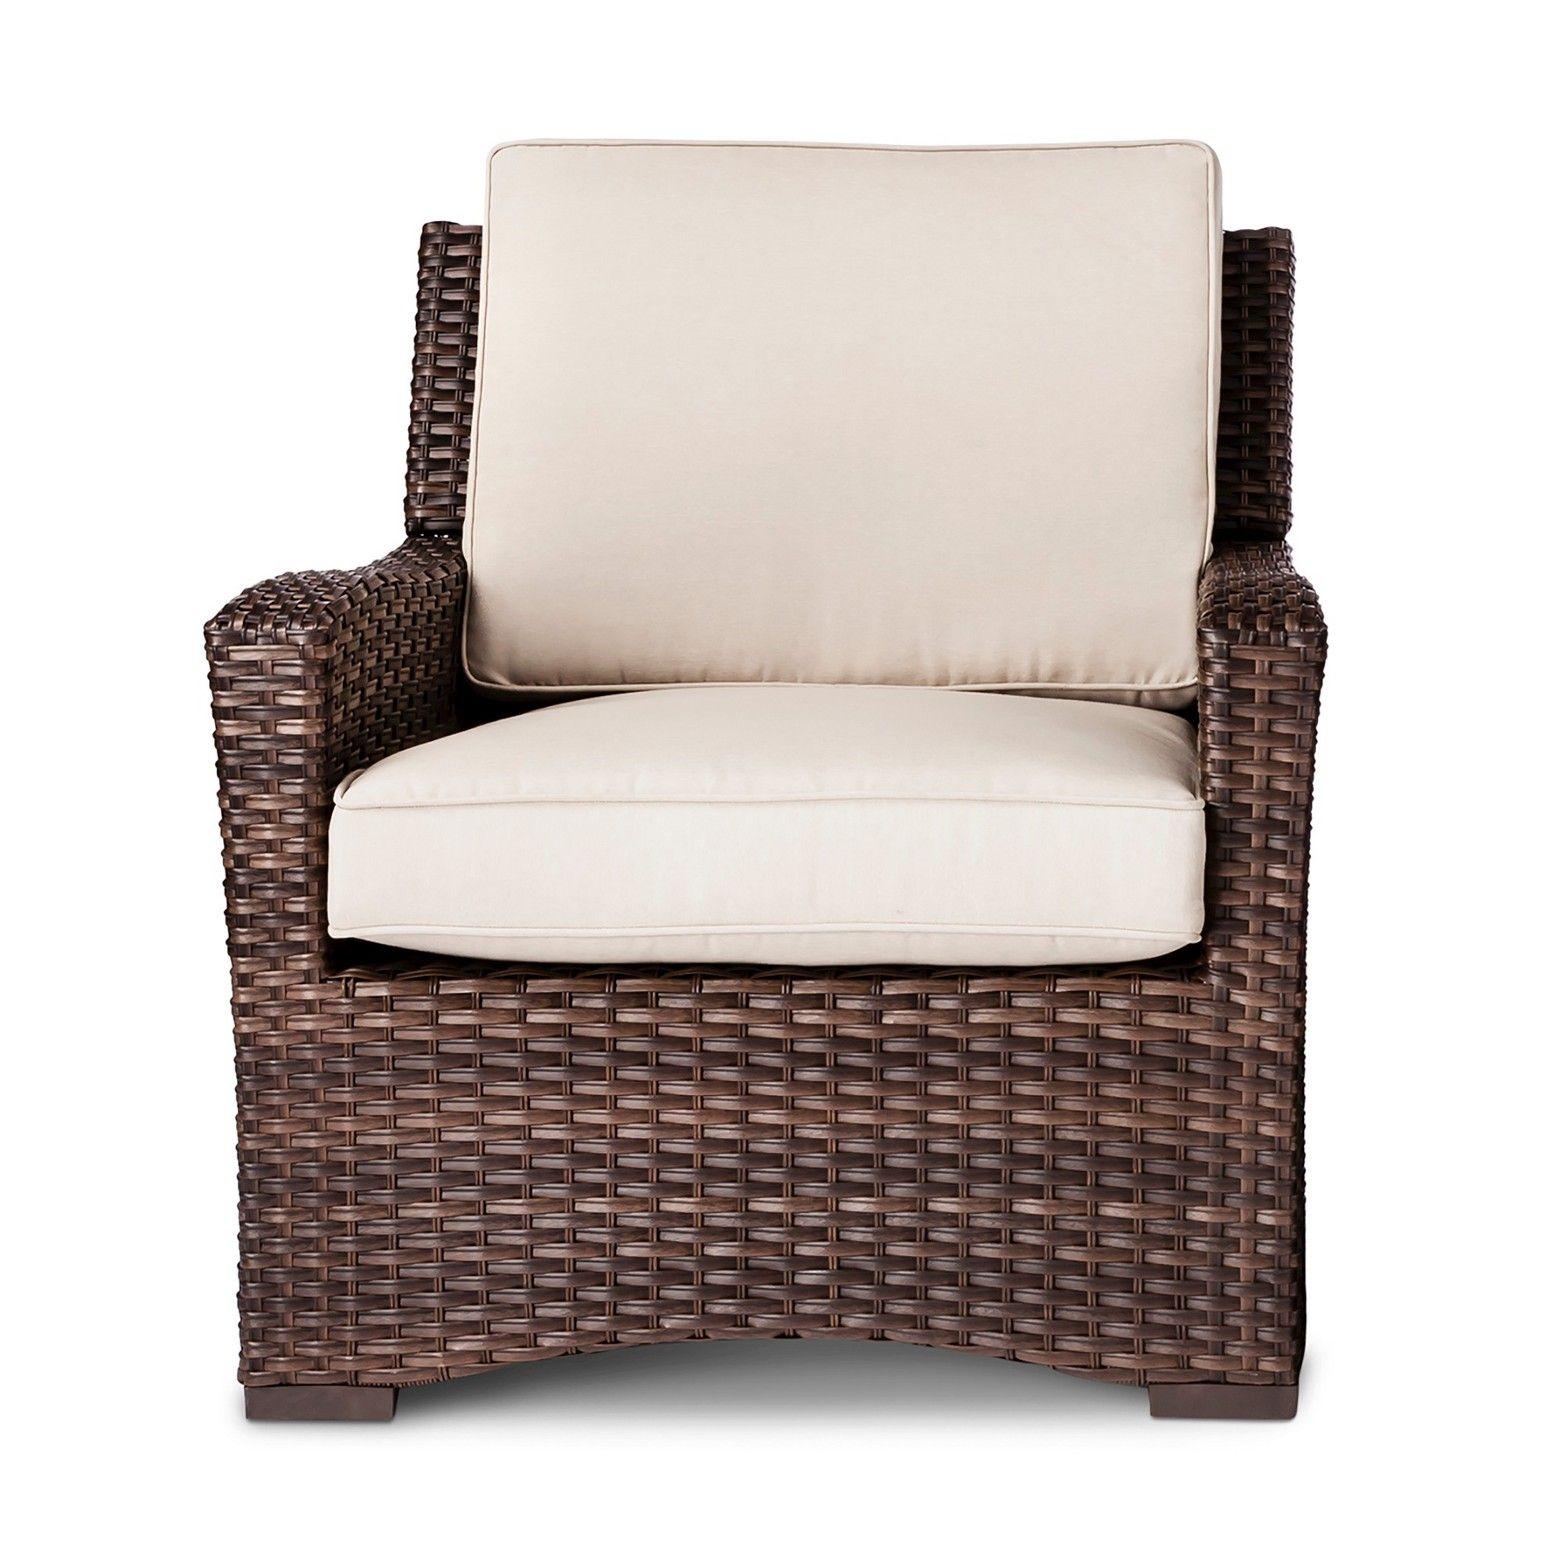 patio chair amazon b covers outdoor com vonhaus